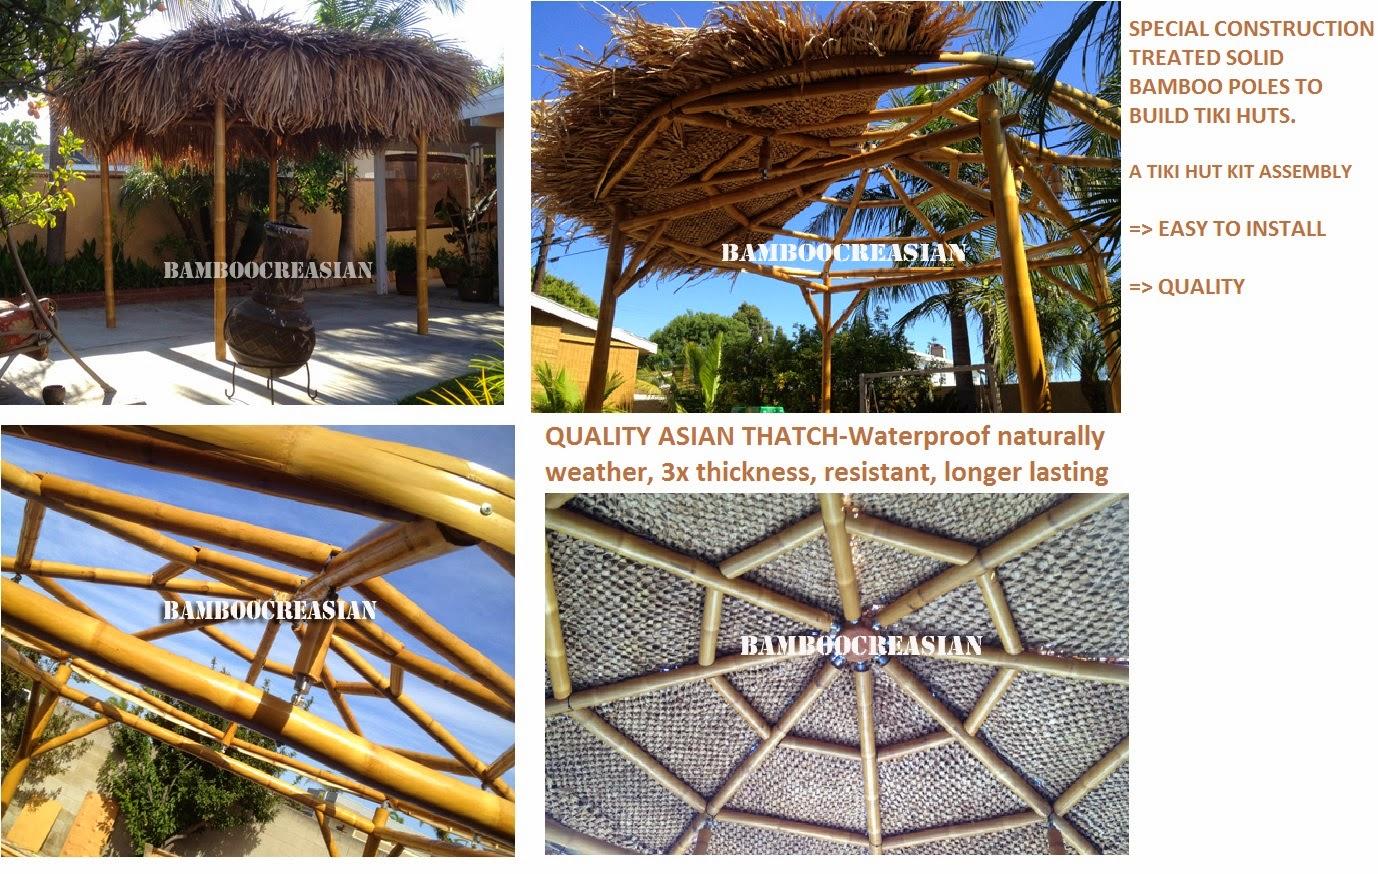 Bamboo materialsfor constructionecofriendly building interior